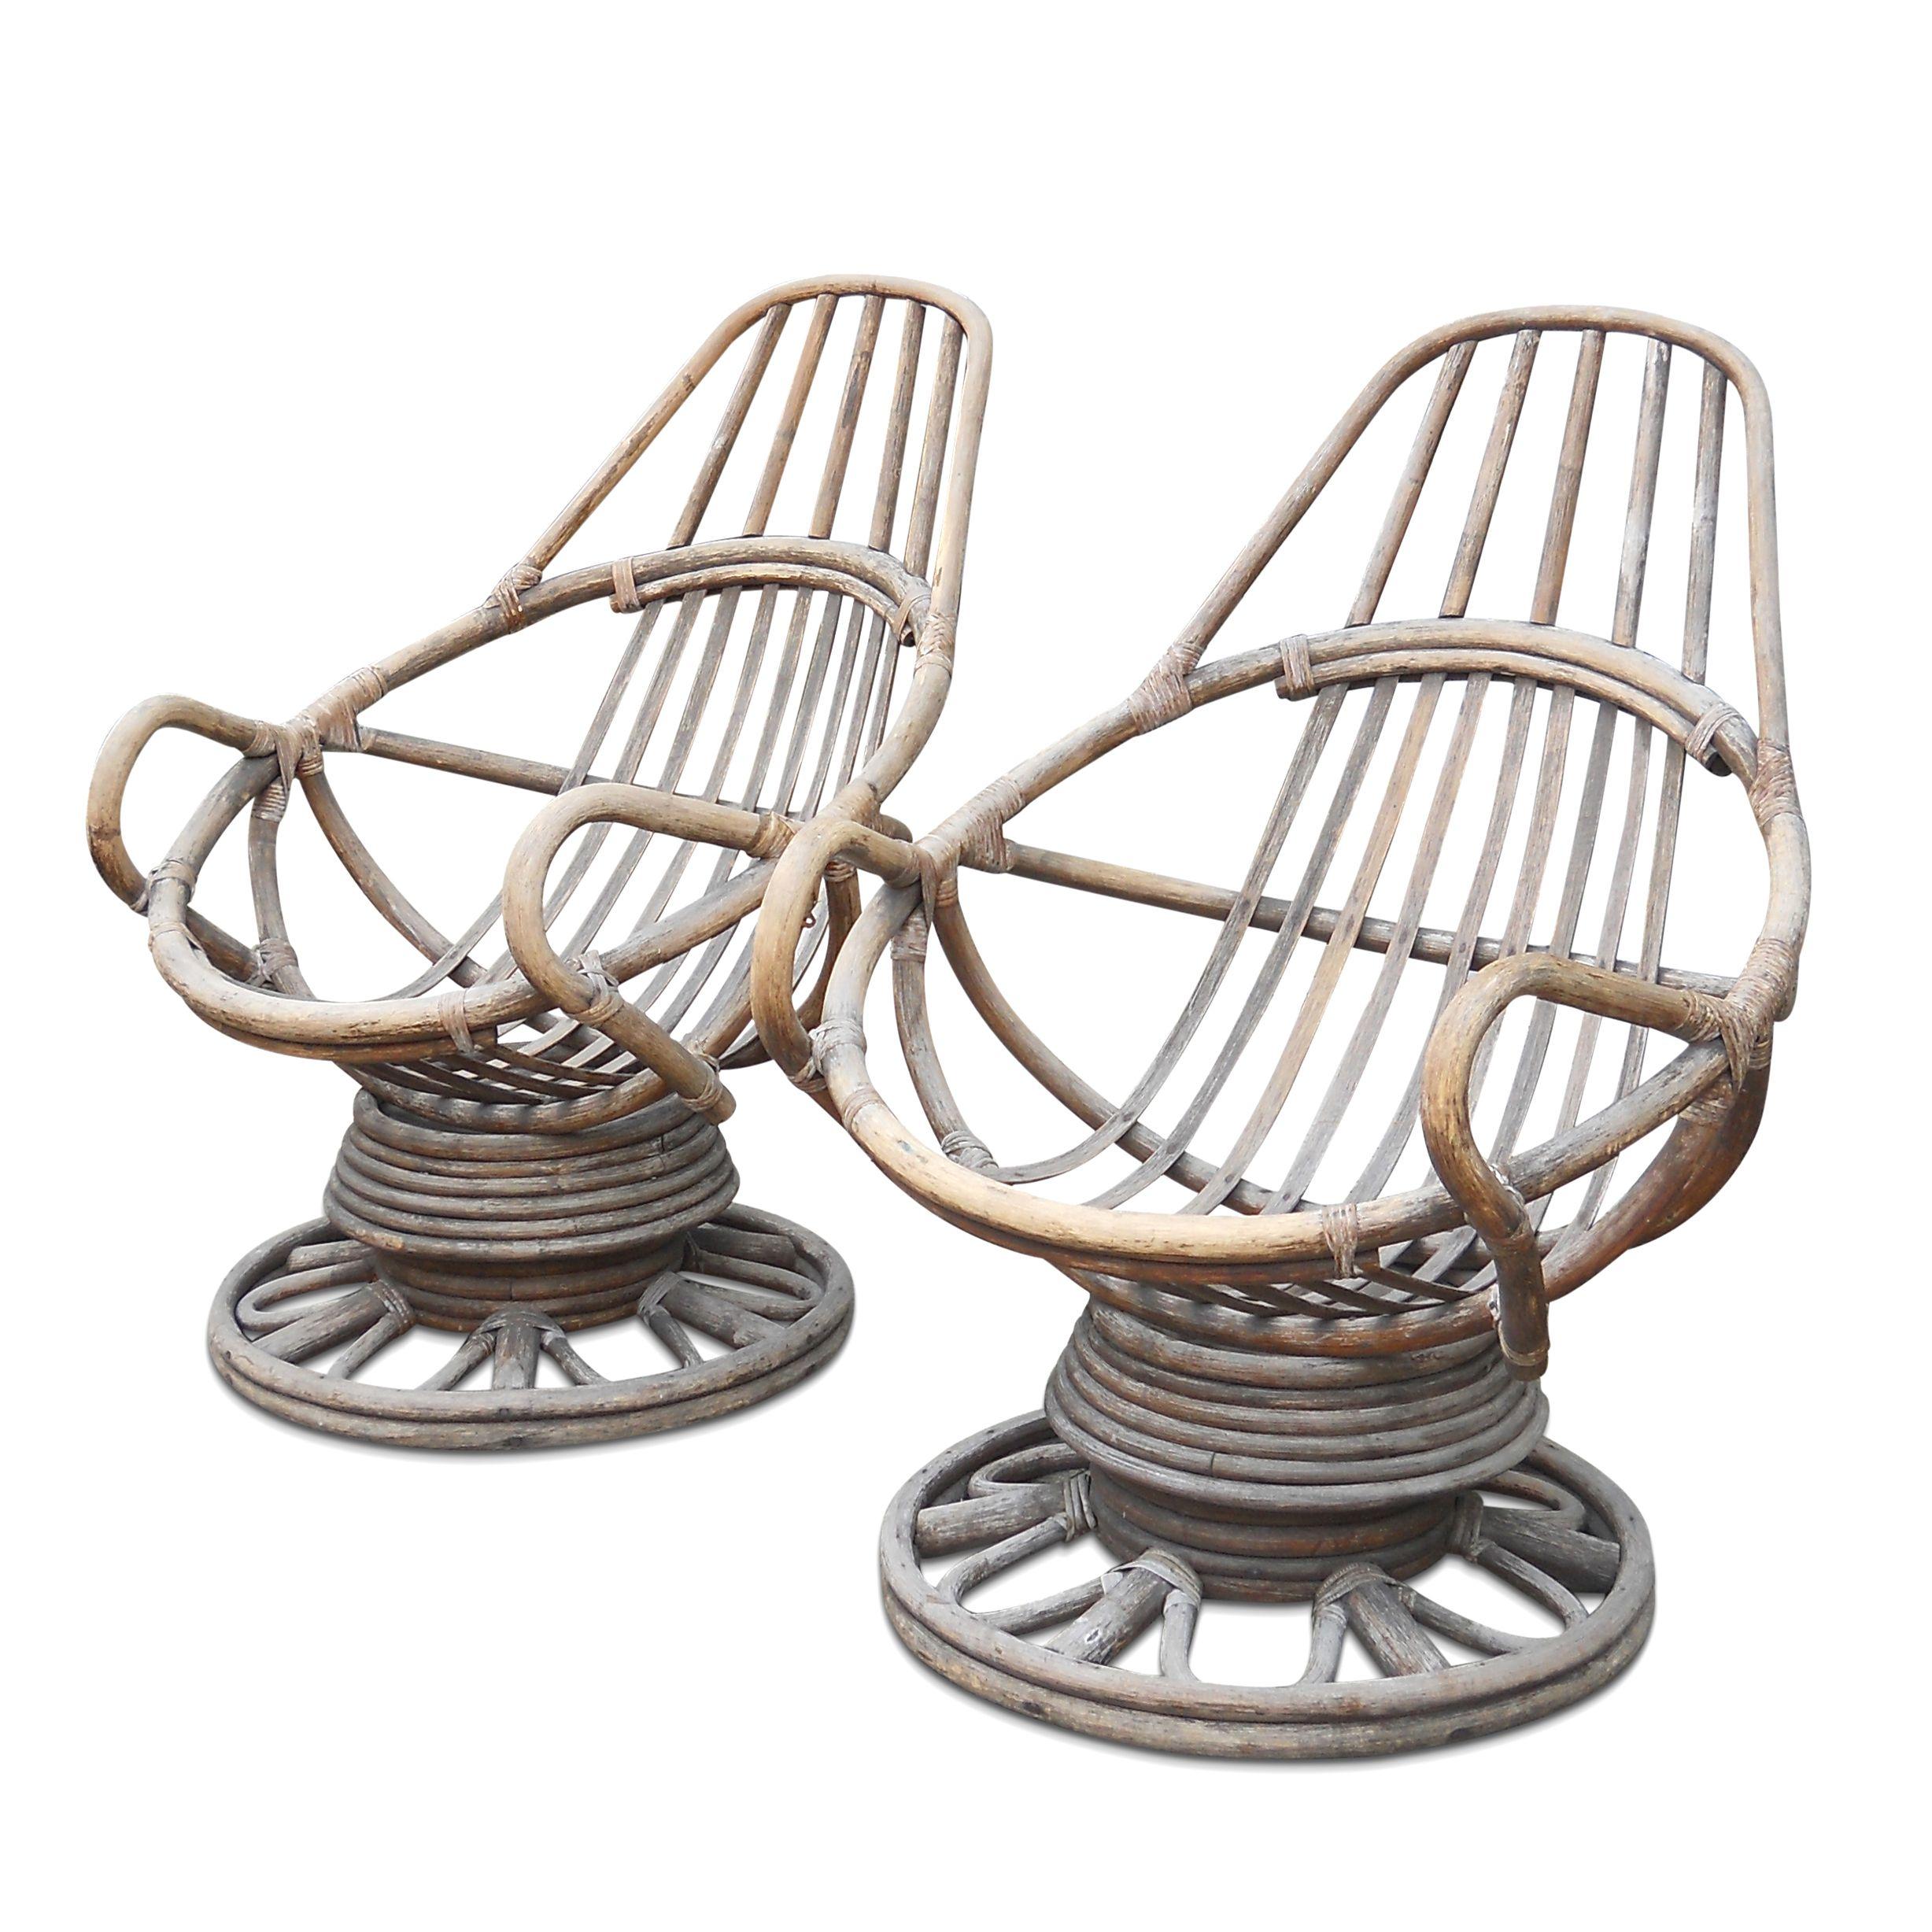 Marvelous Home Decor Rattan Swivel Desk Chair Charming Wingate Source Information